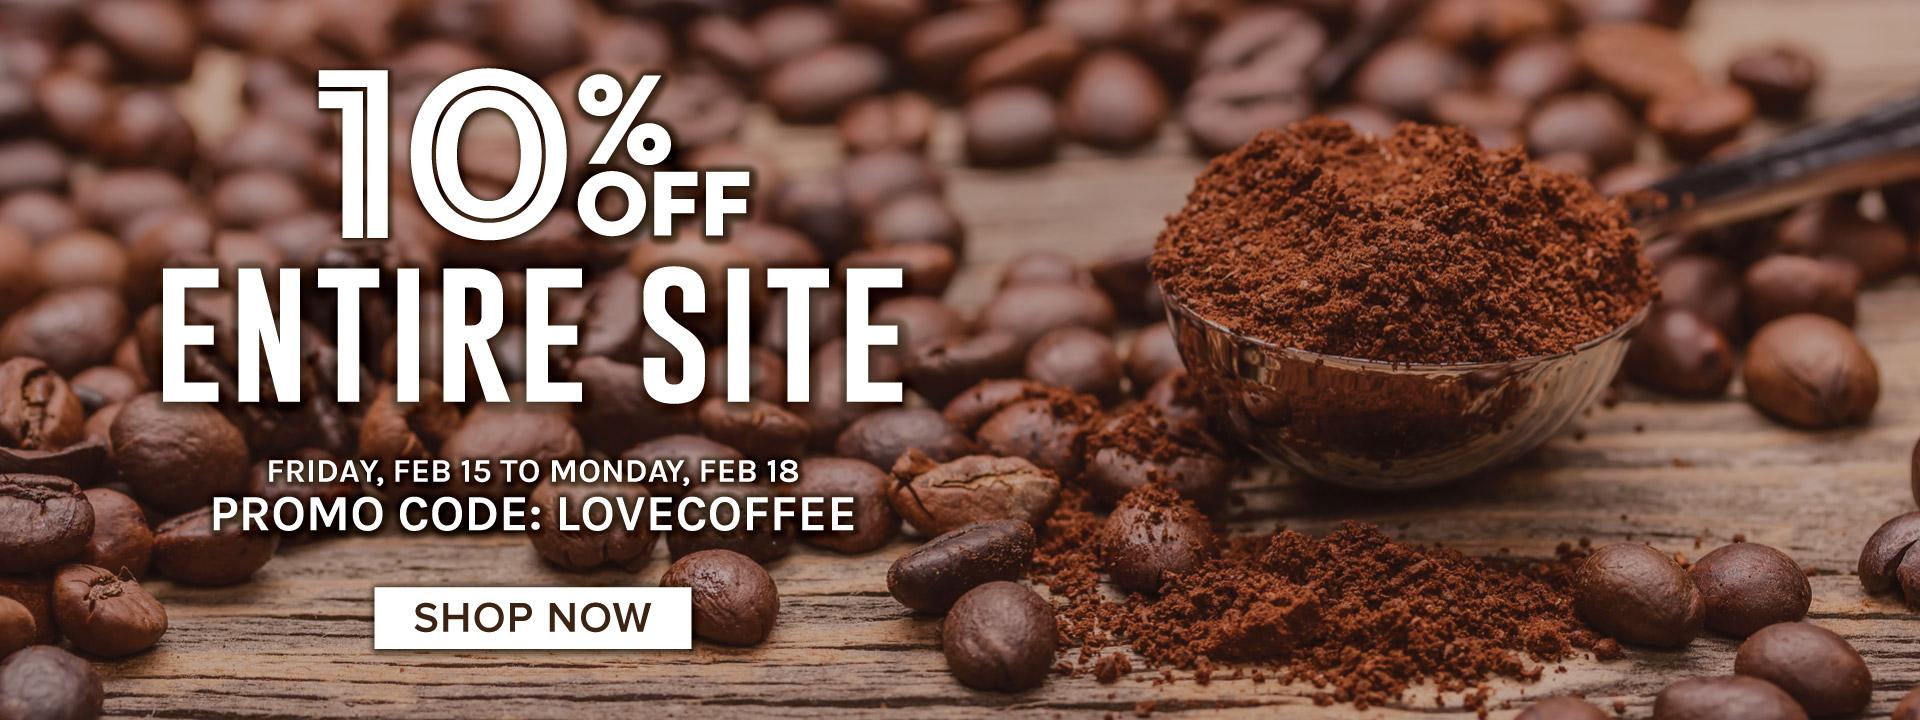 lovecoffee